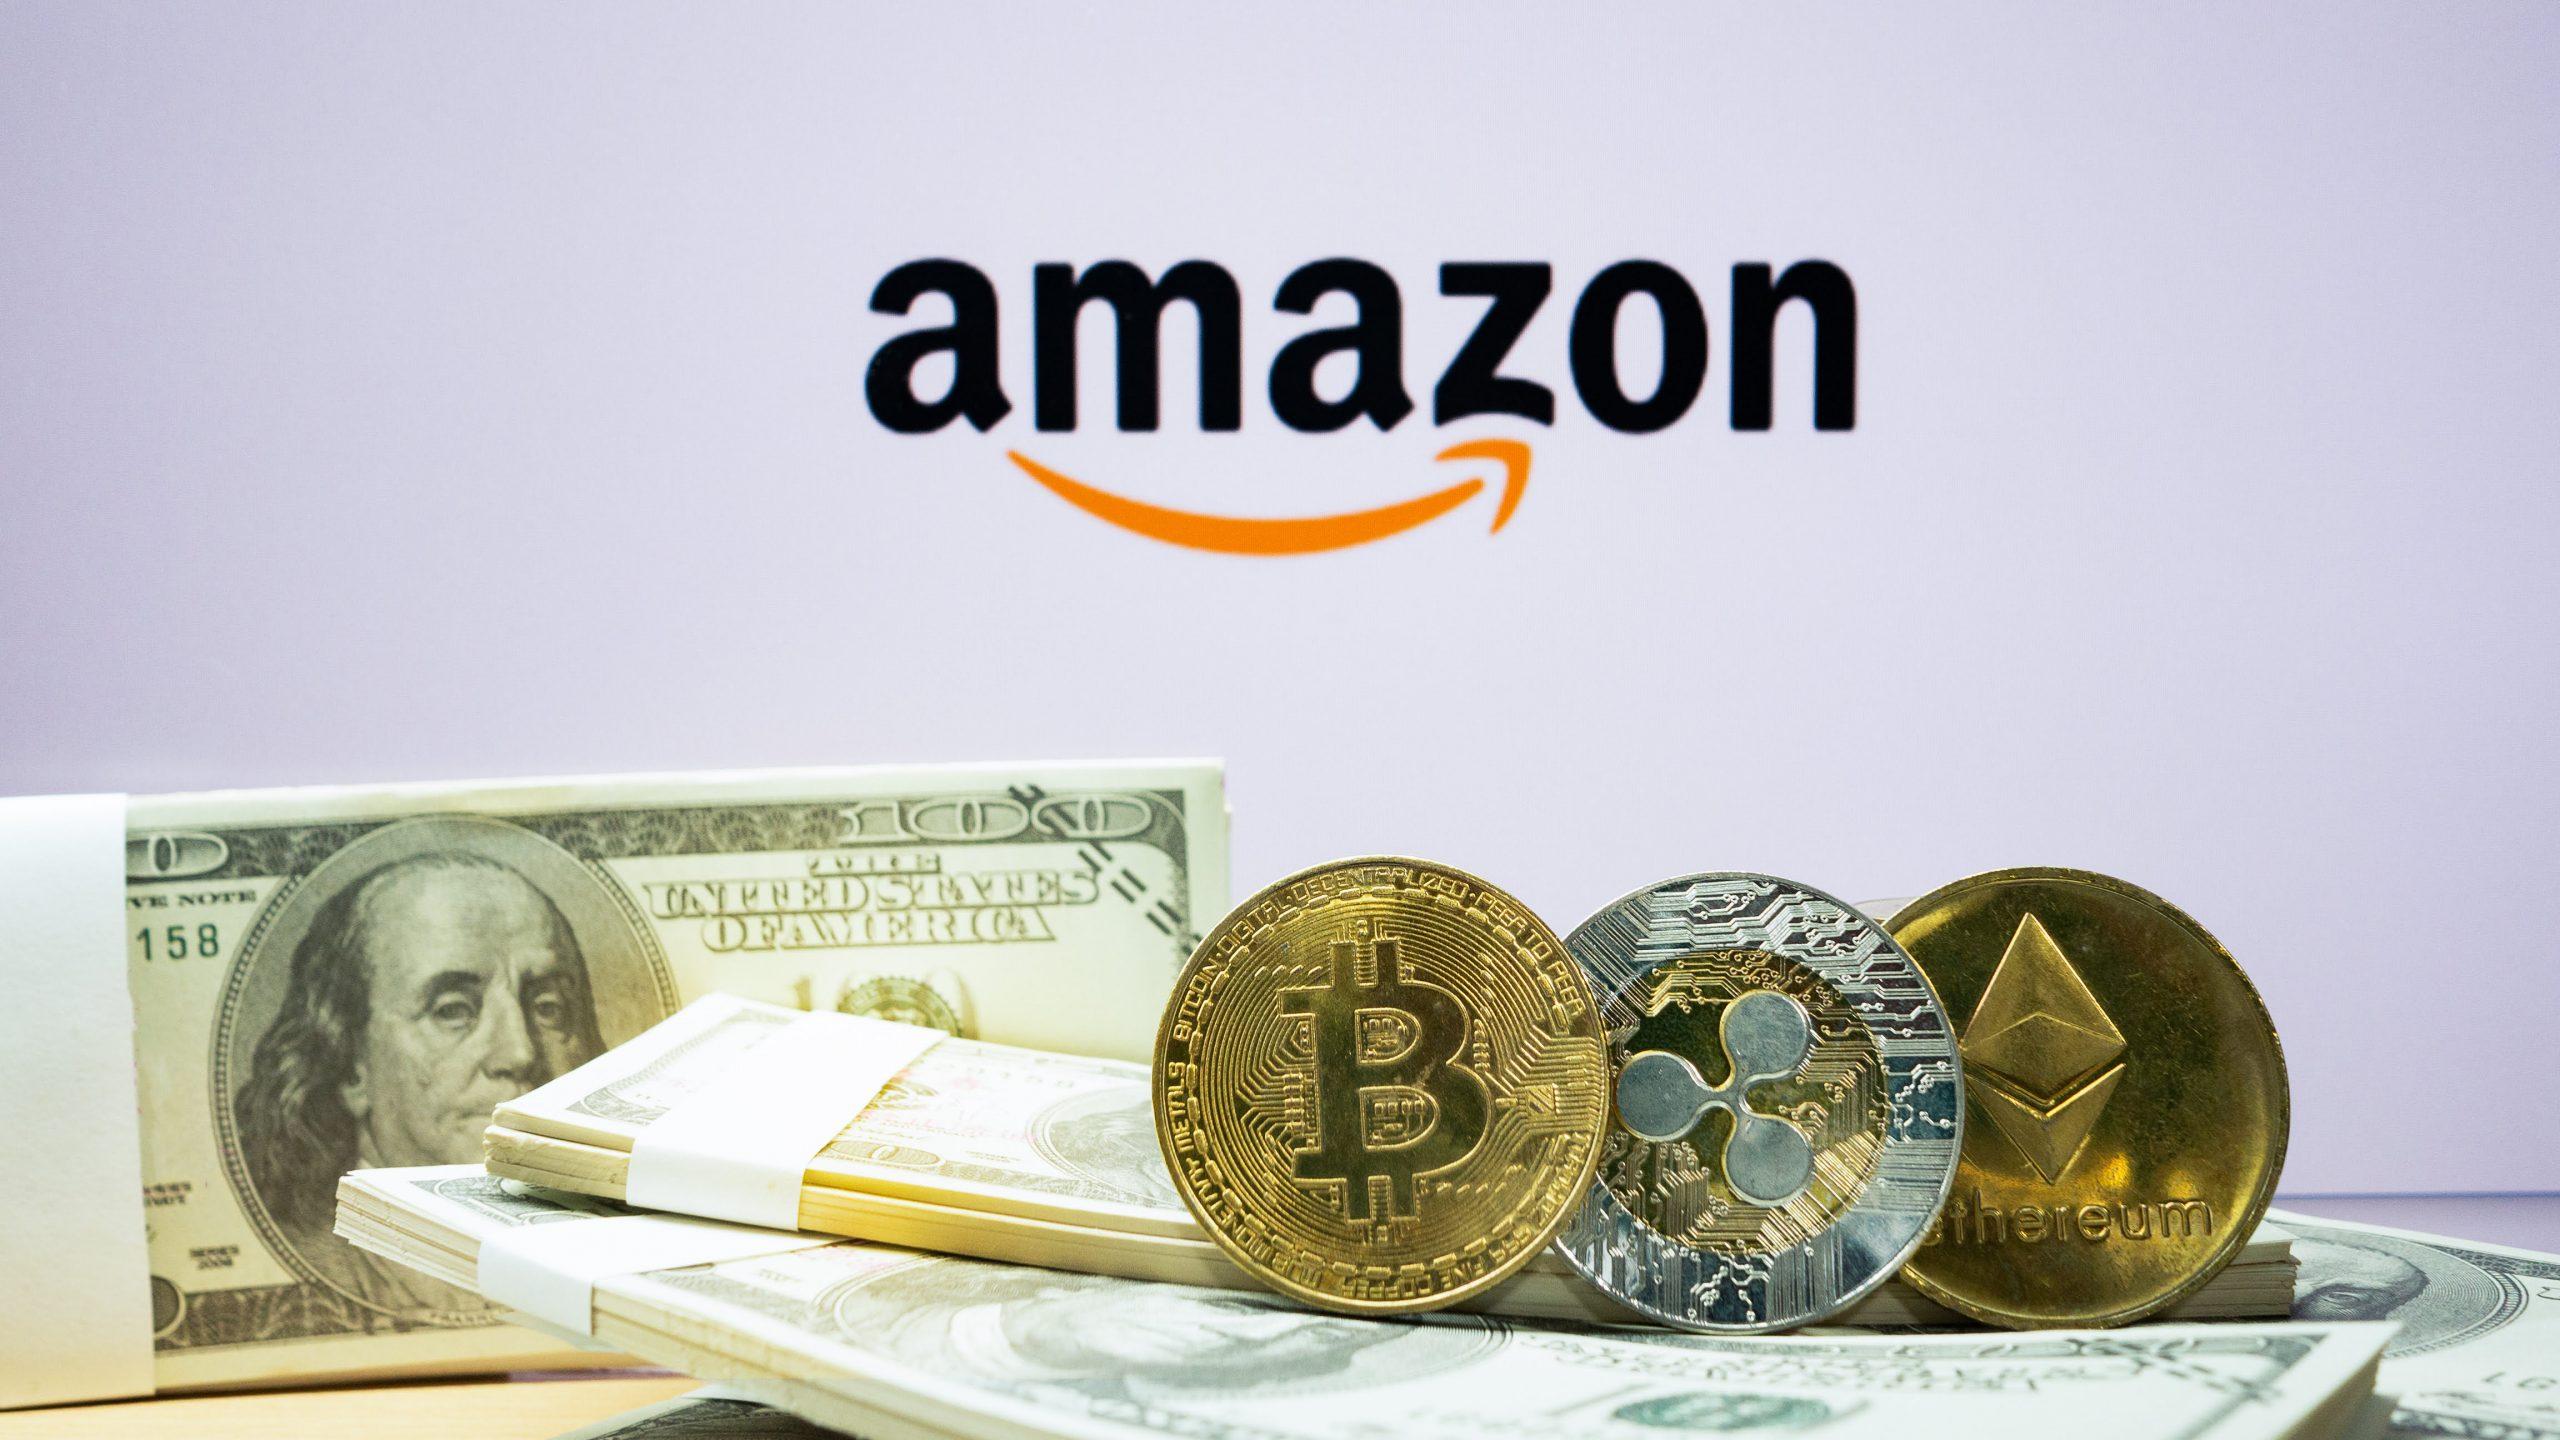 amazon bitcoin crypto blockchain shutterstock 1398562568 scaled